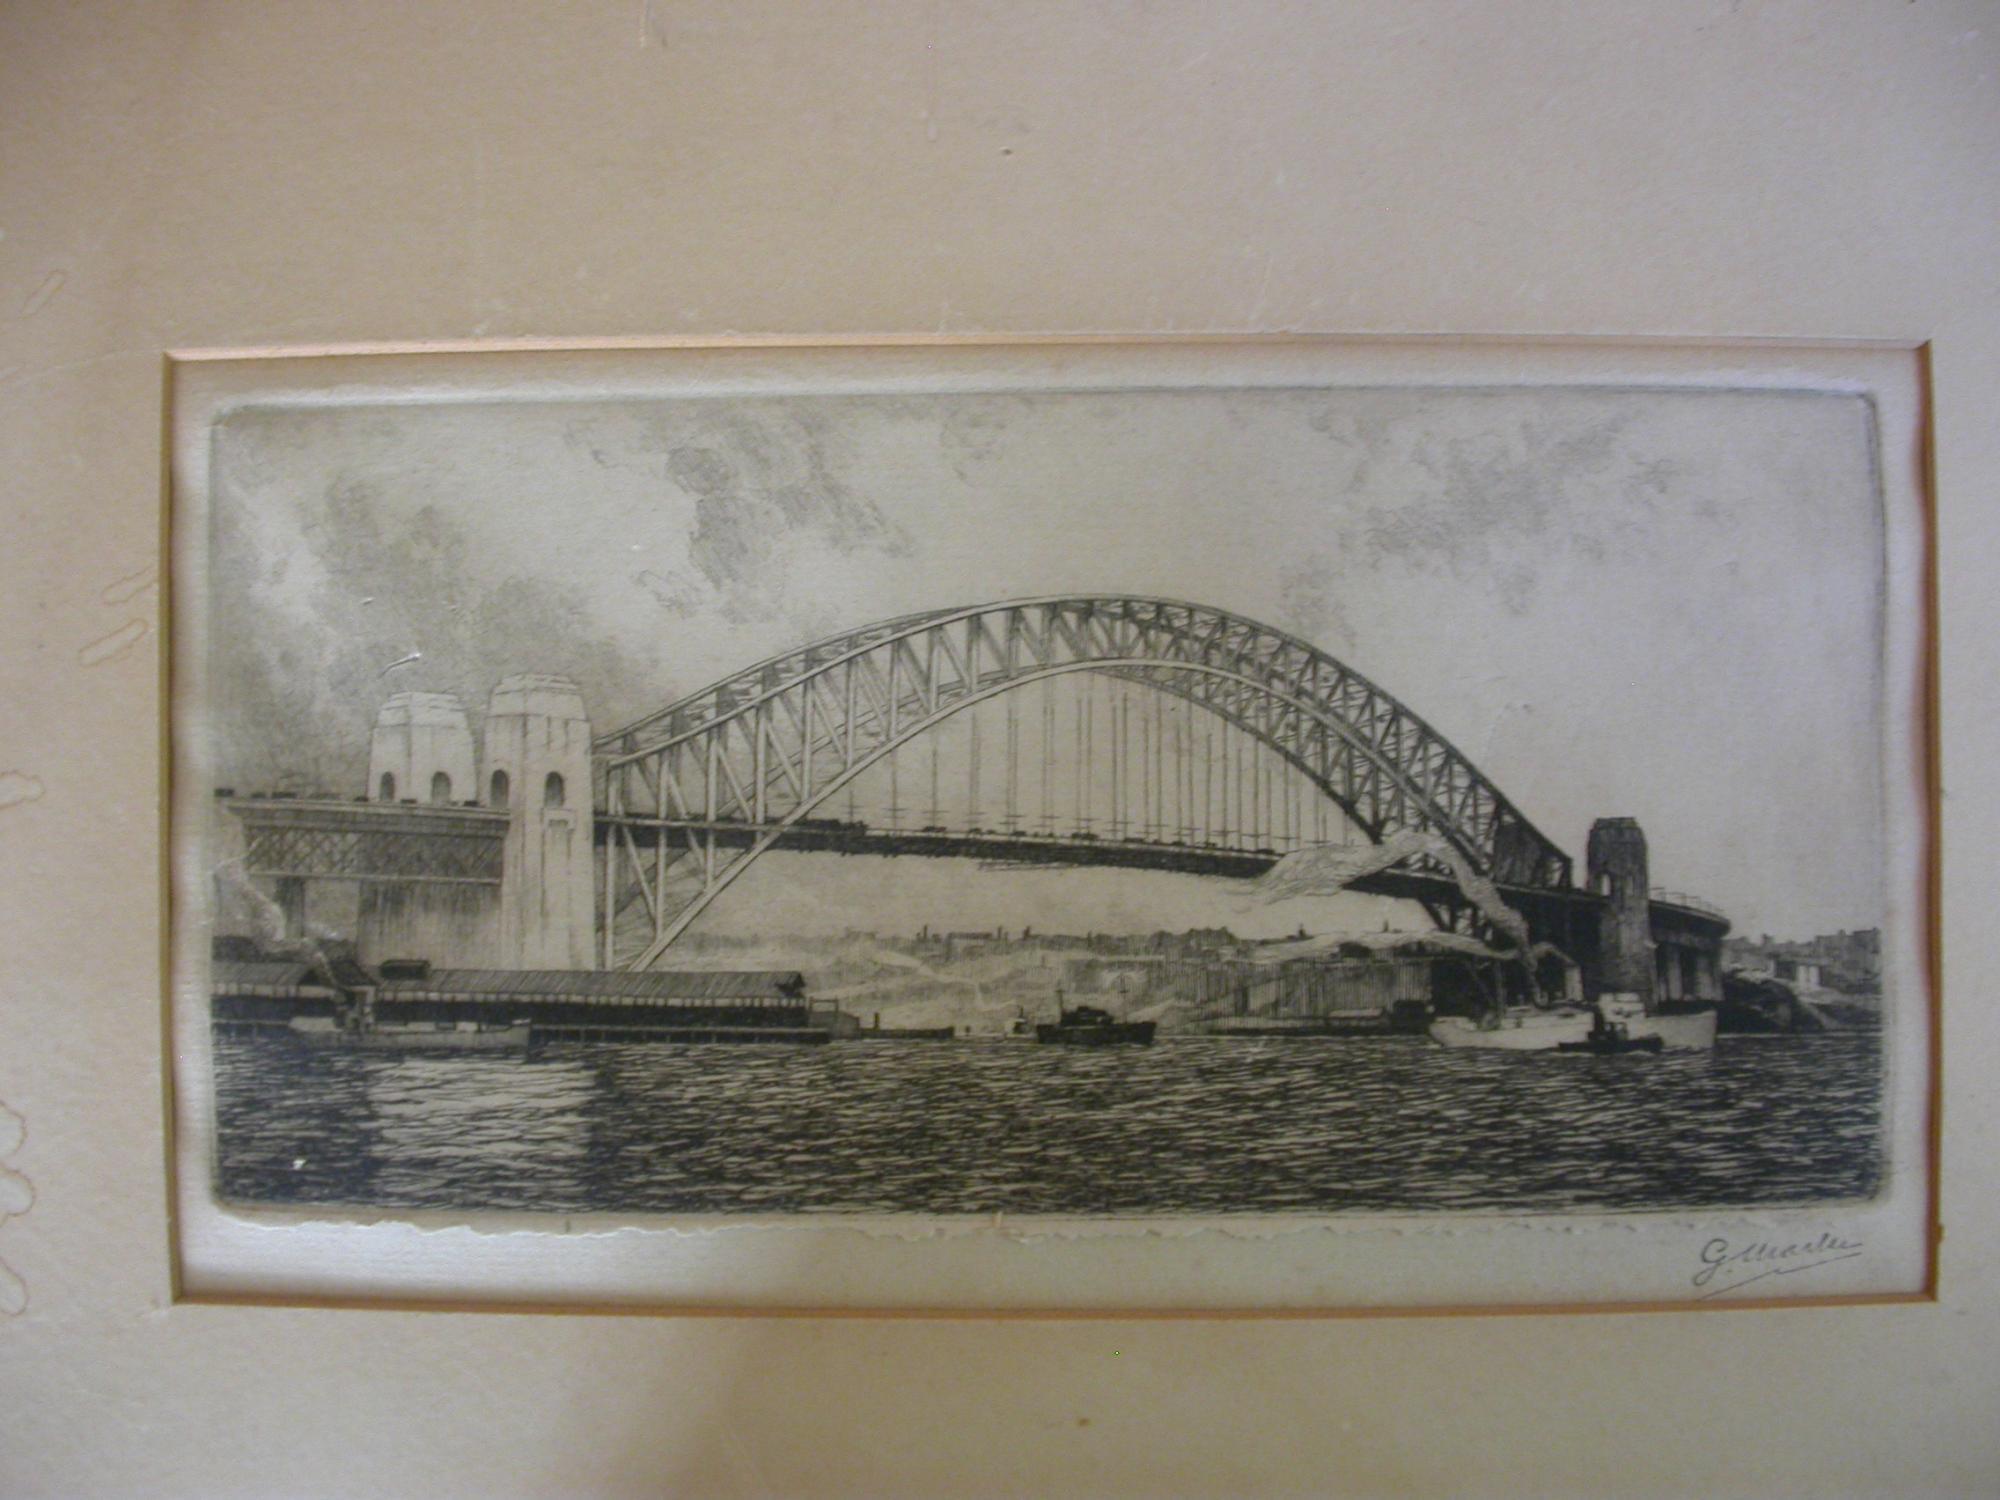 1 orig etching / Orig. Radierung .: Warner, Edward (Illustr.)